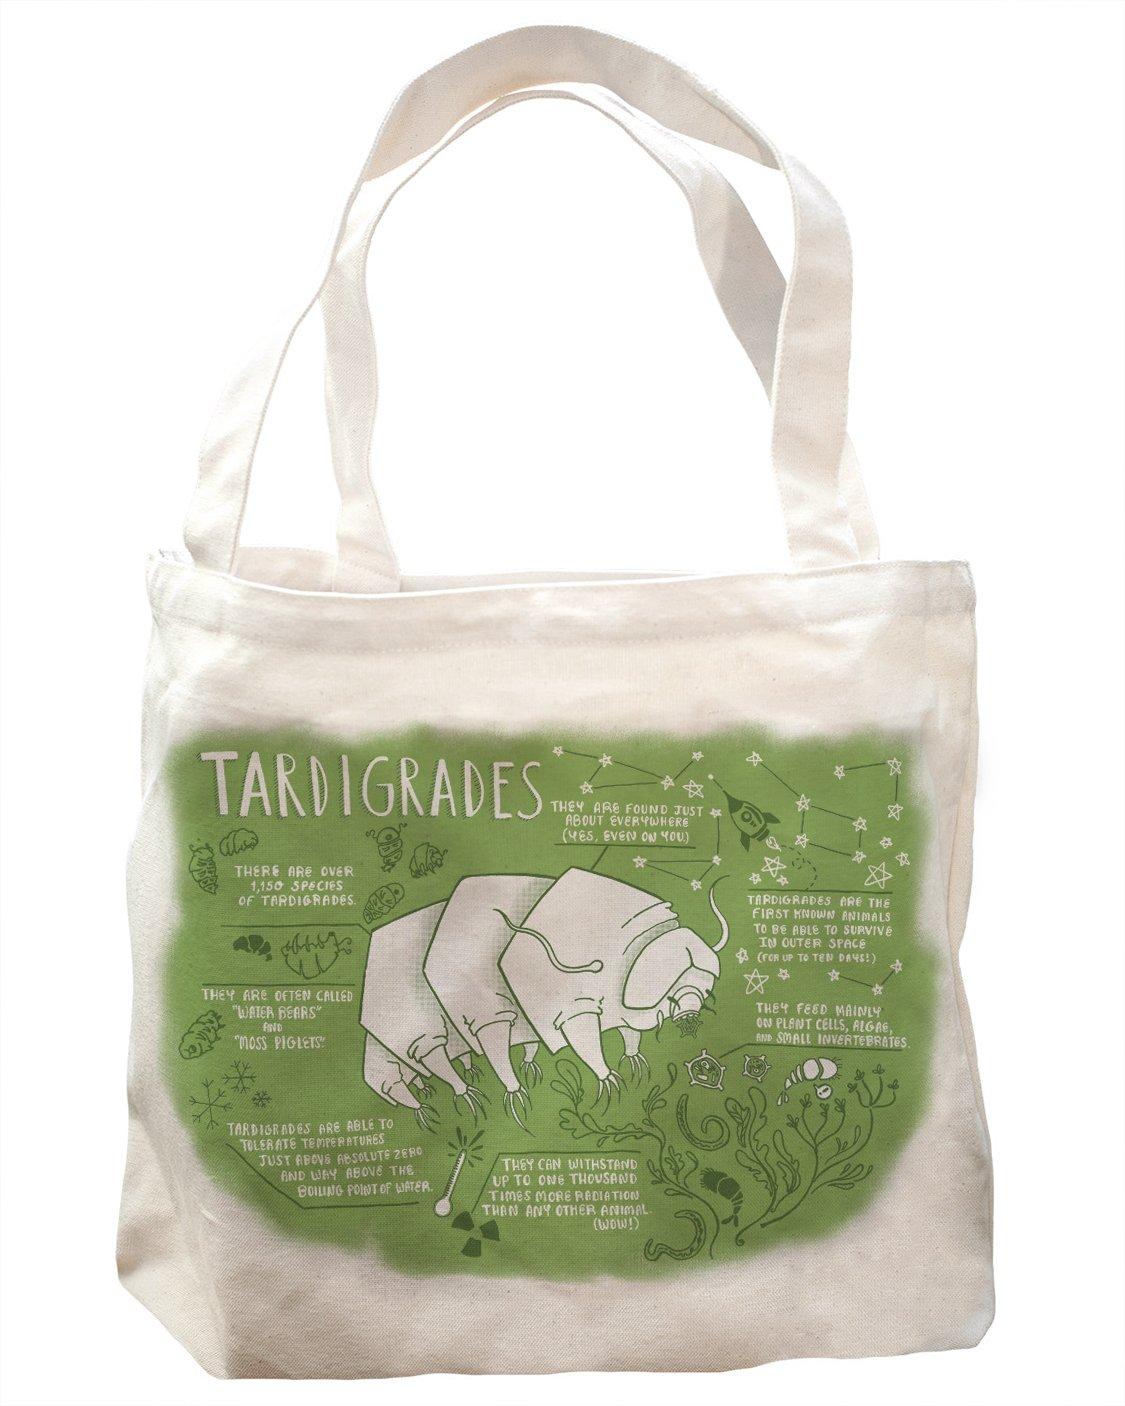 Cognitive Surplus Illustration Tardigrades Cartoon Tote Bag 10 oz Recycled Cotton